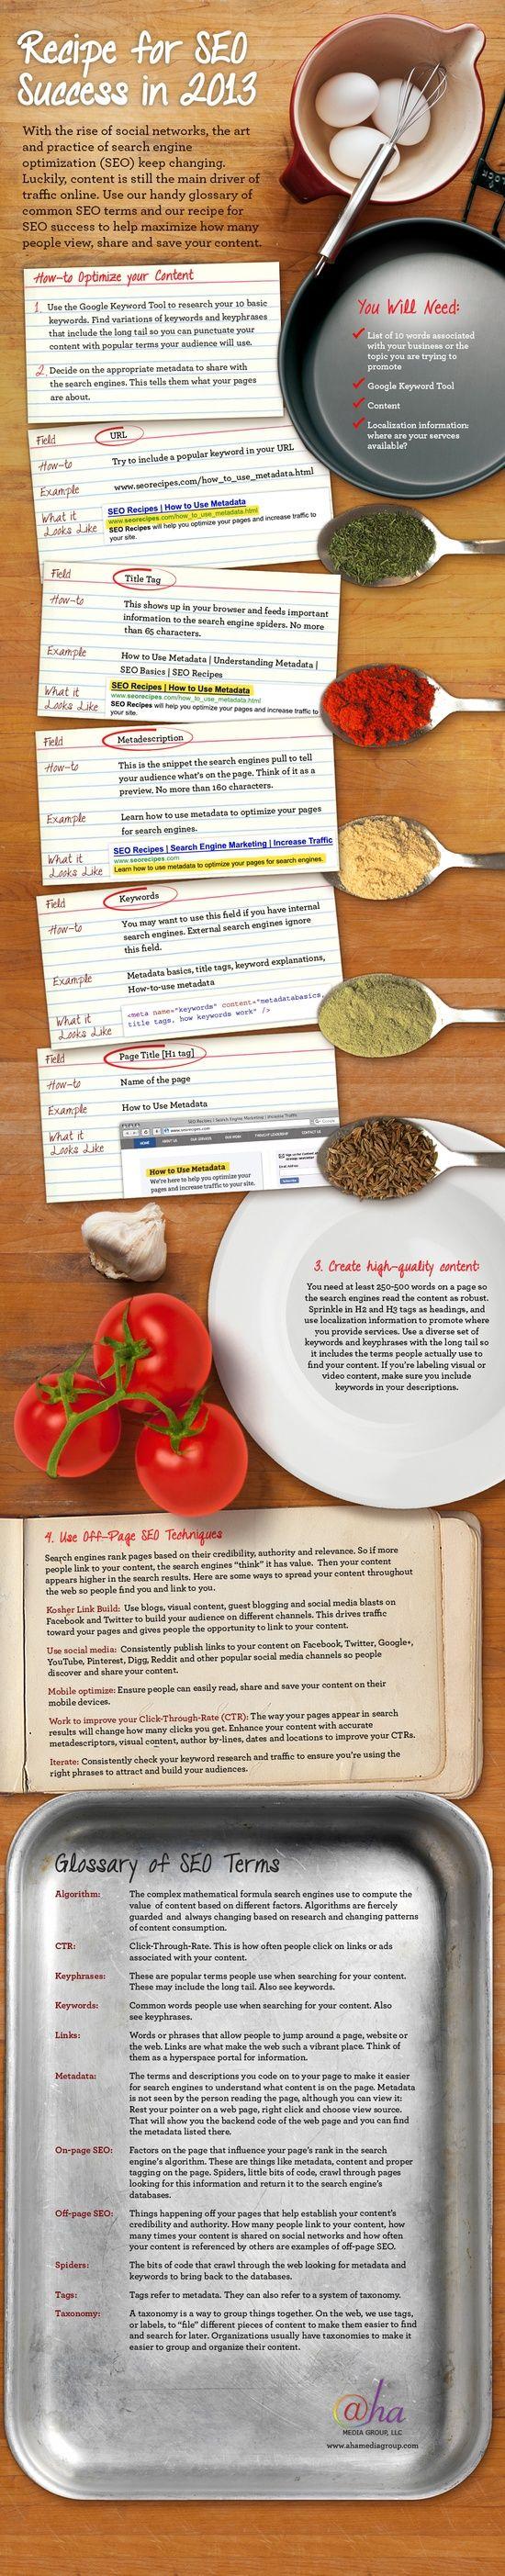 Recipe for SEO Success in 2013